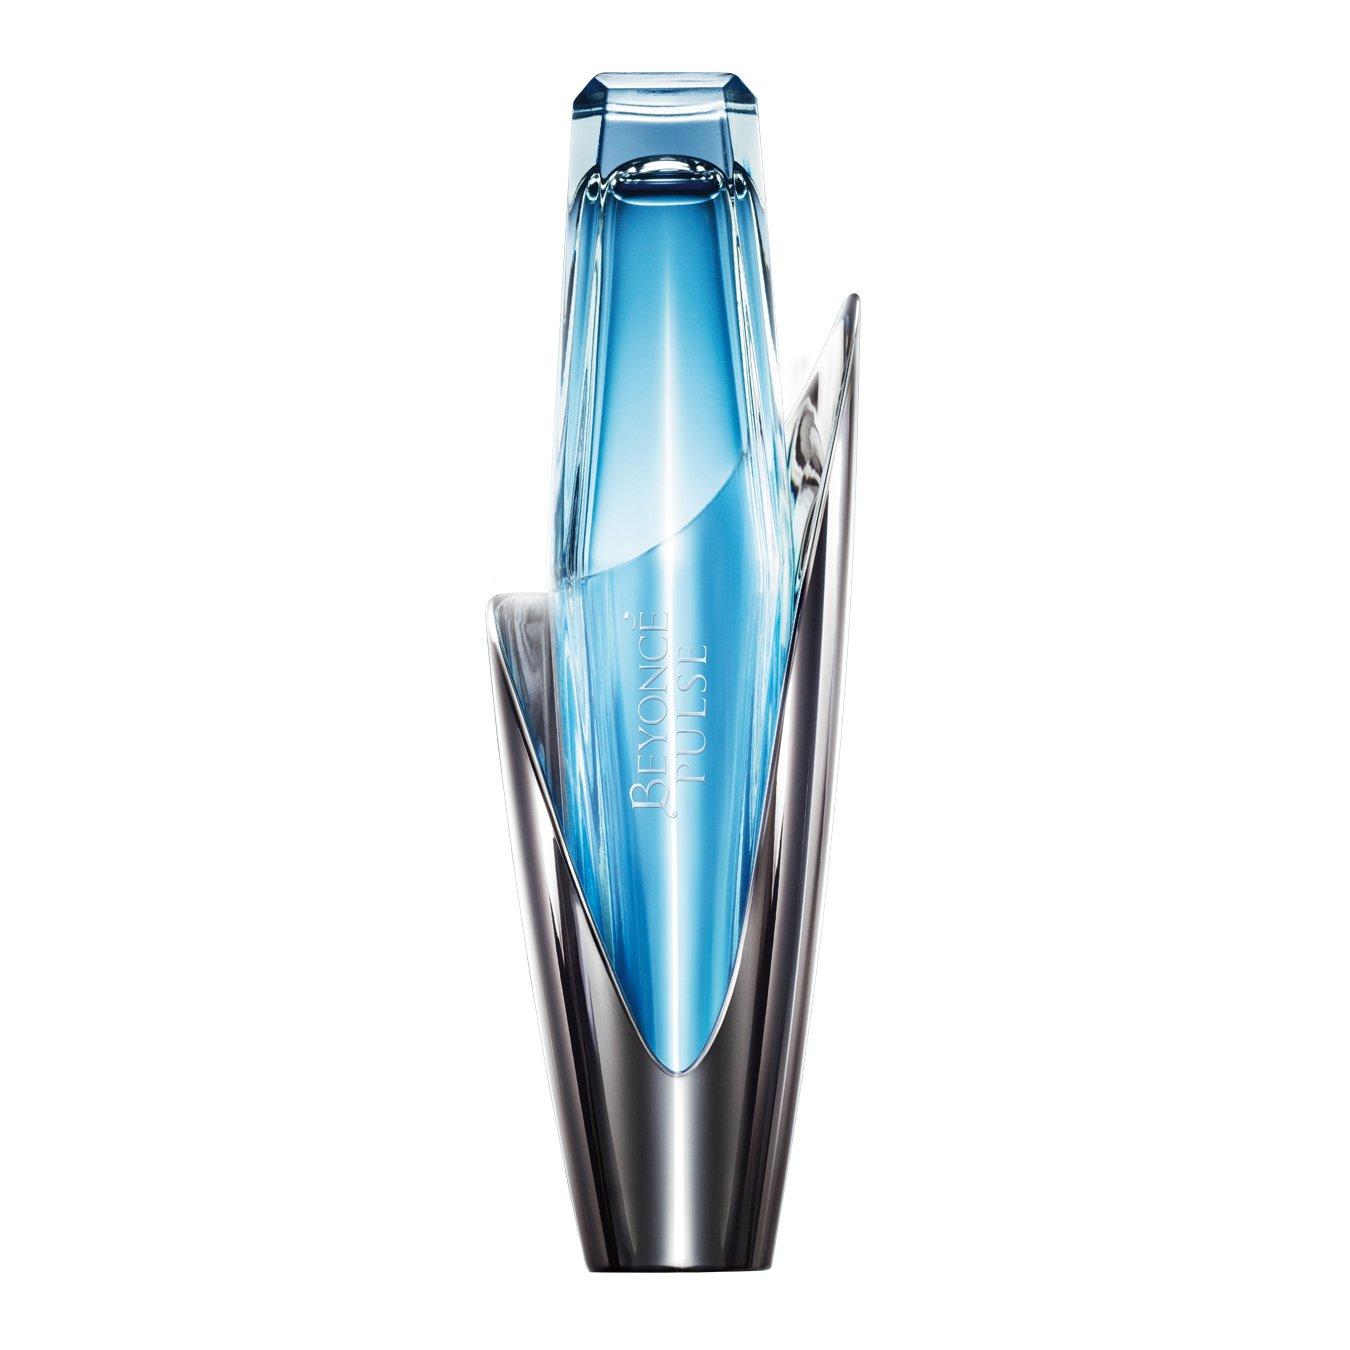 Beyonce Pulse Eau De Parfum Spray for Women, 3.4 Ounce